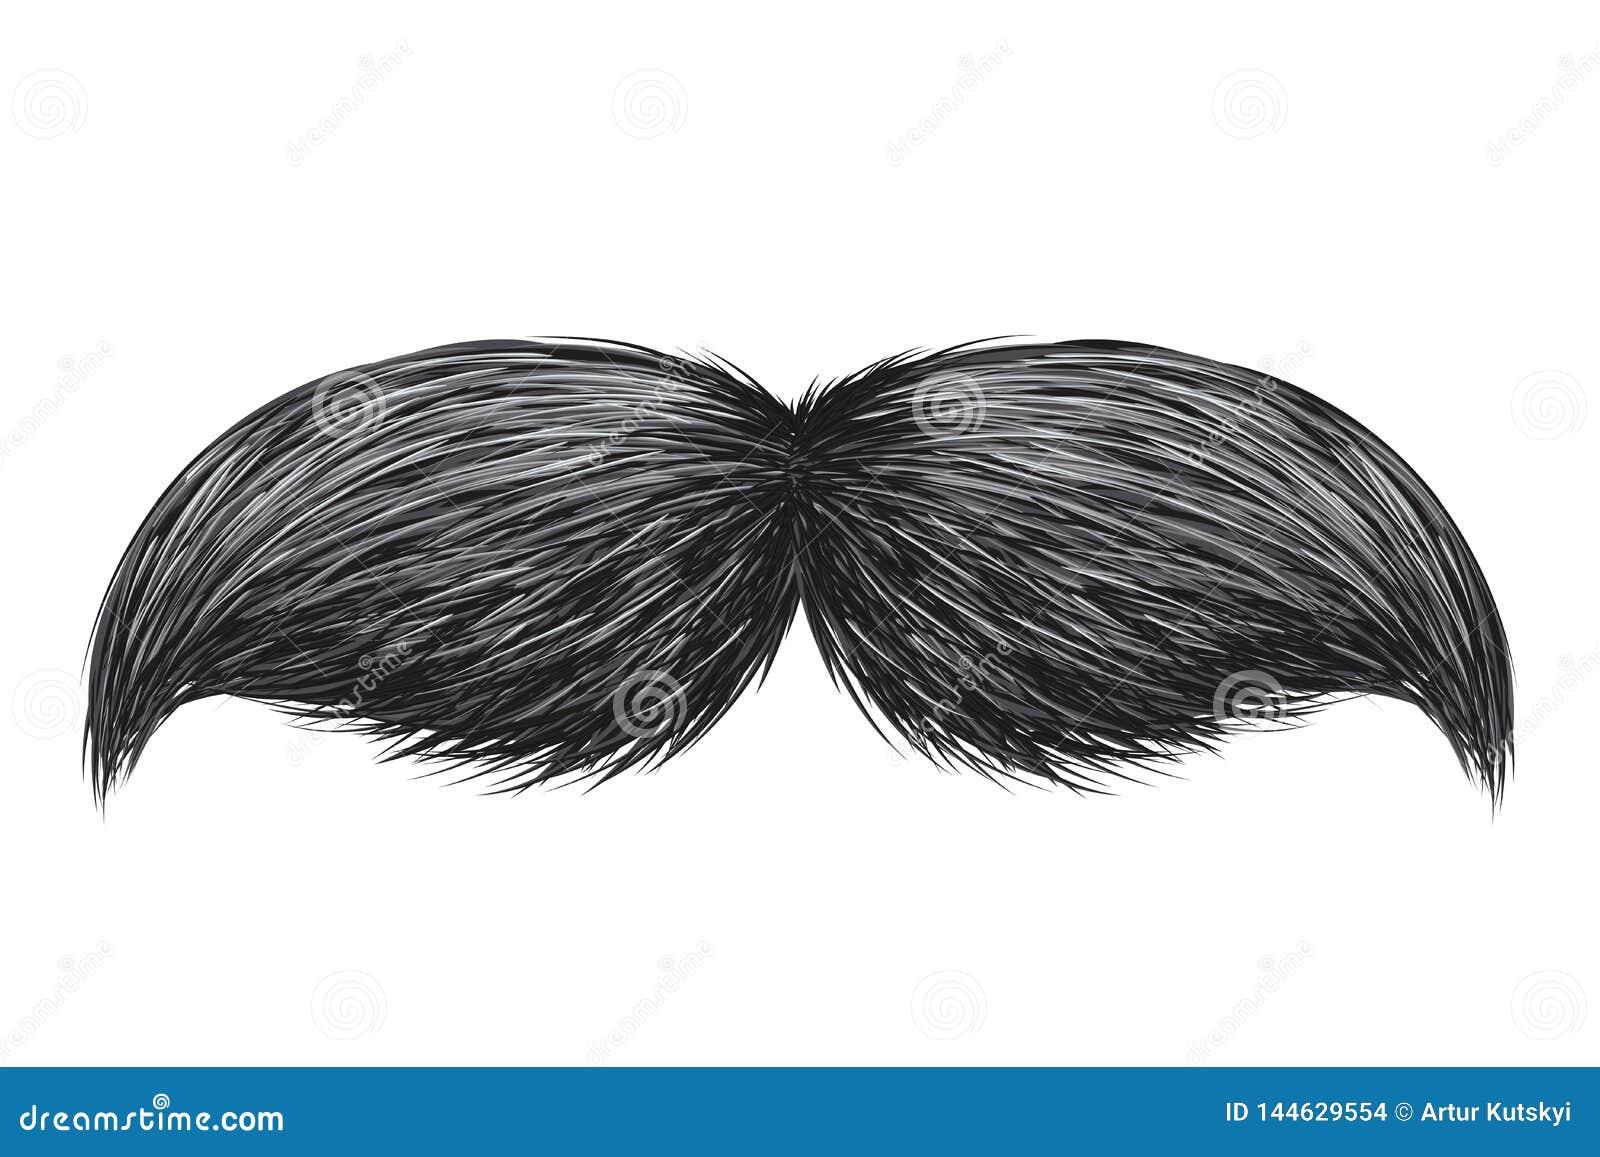 Realistic vintage classic retro mustache isolated vector illustration.